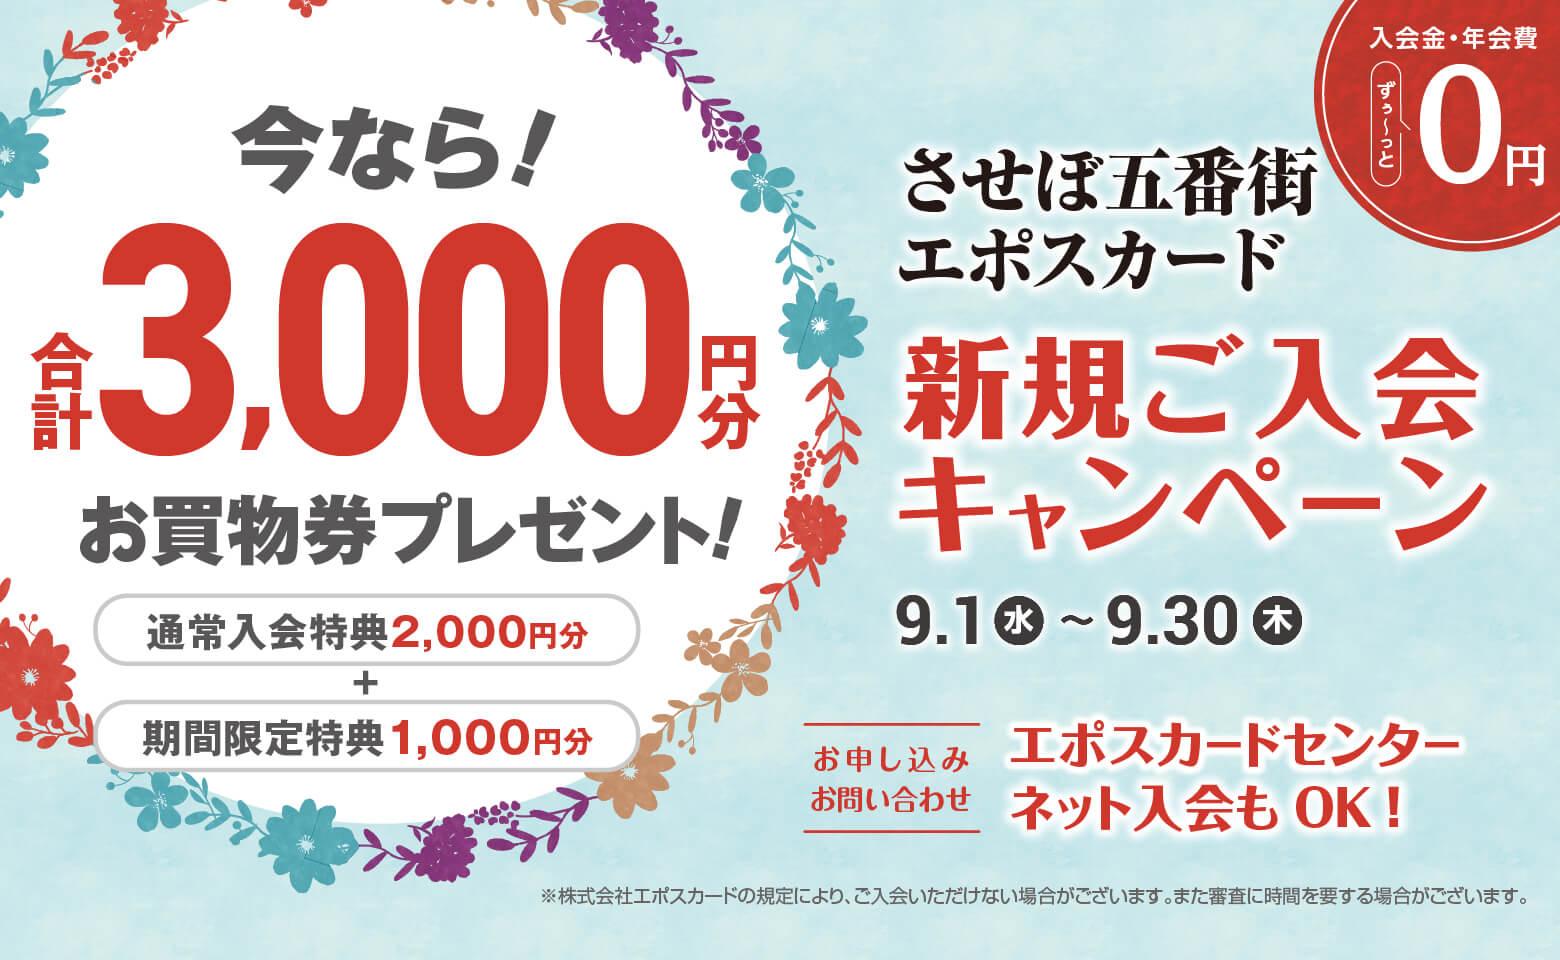 EPOS入会キャンペーン